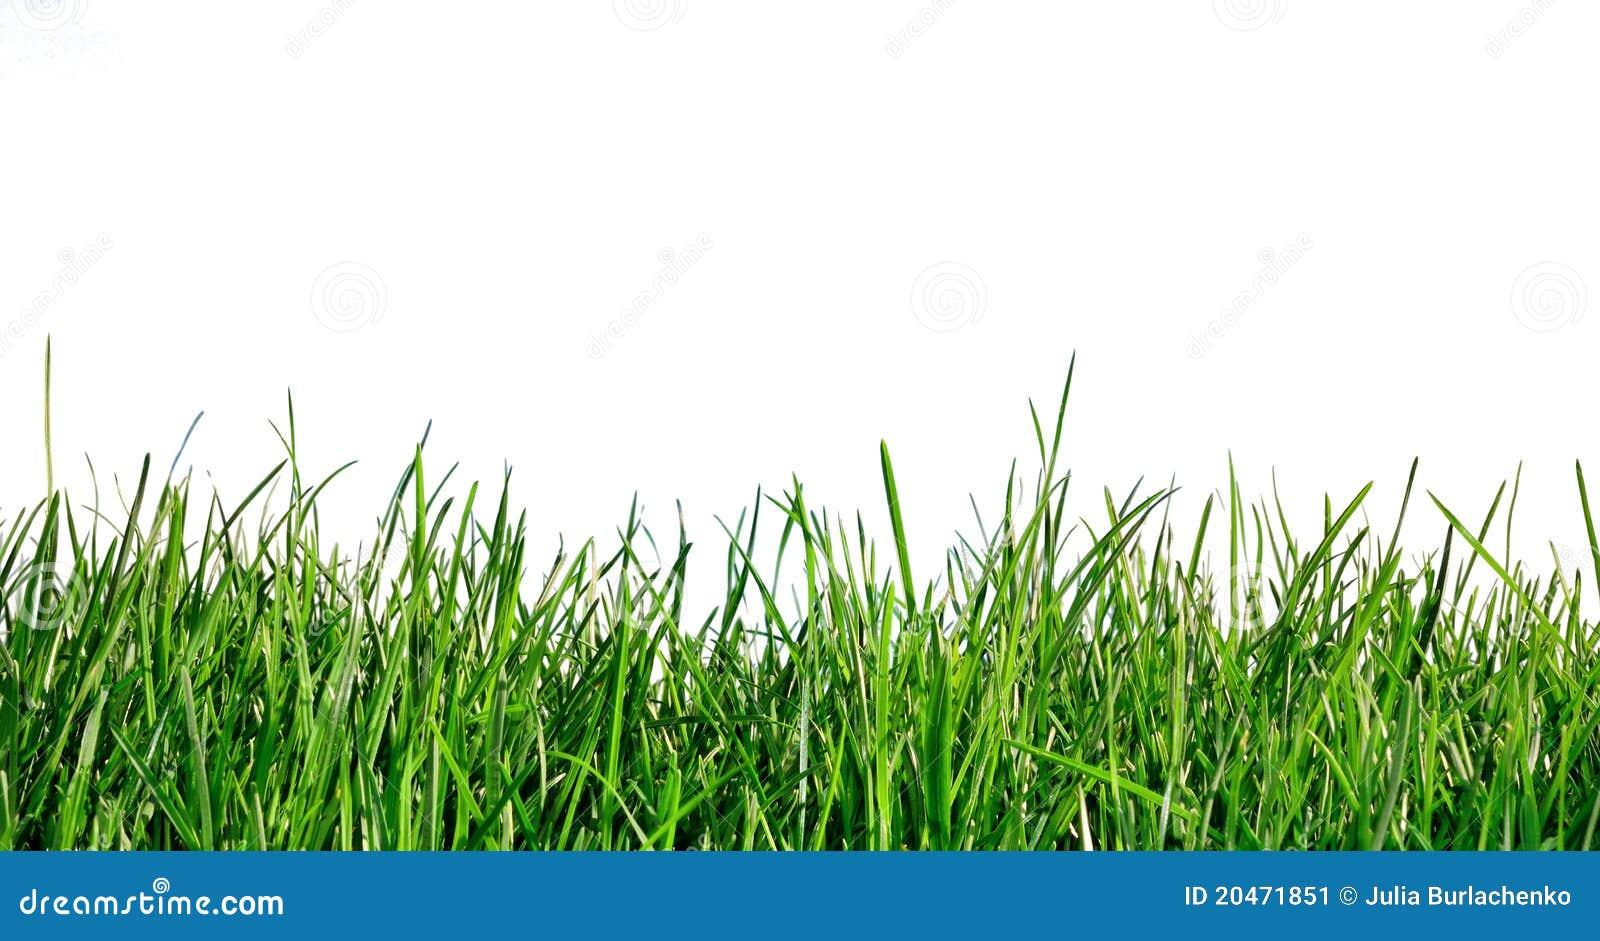 grass on white background stock image image 20471851